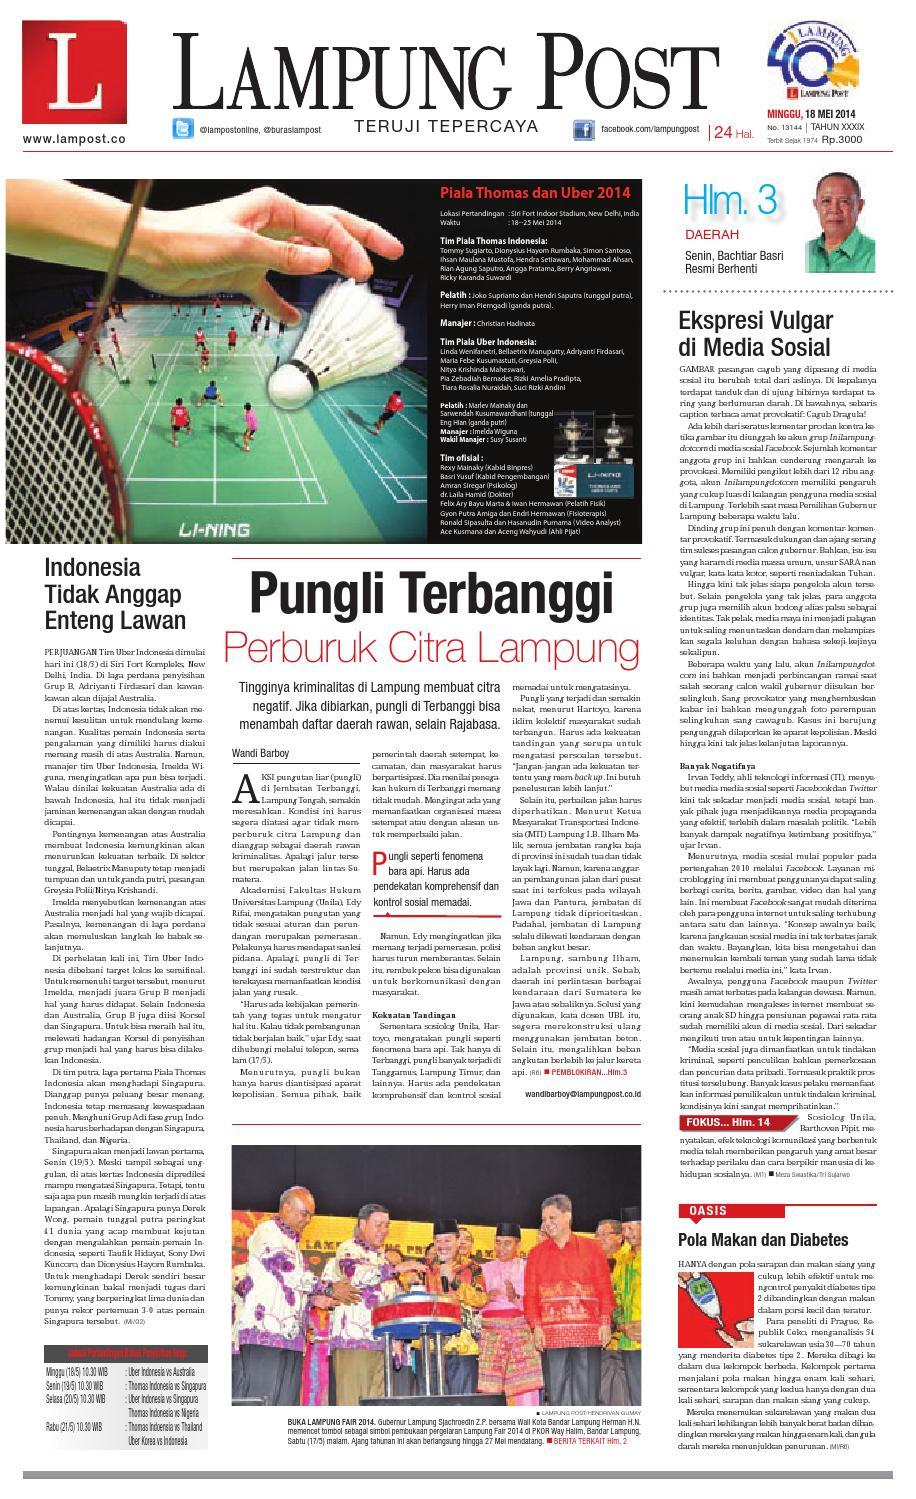 Lampungpost Edisi 18 Mei 2014 By Dorizo Hermawan Issuu Produk Ukm Bumn Jamu Kunyit Asam Seger Waras